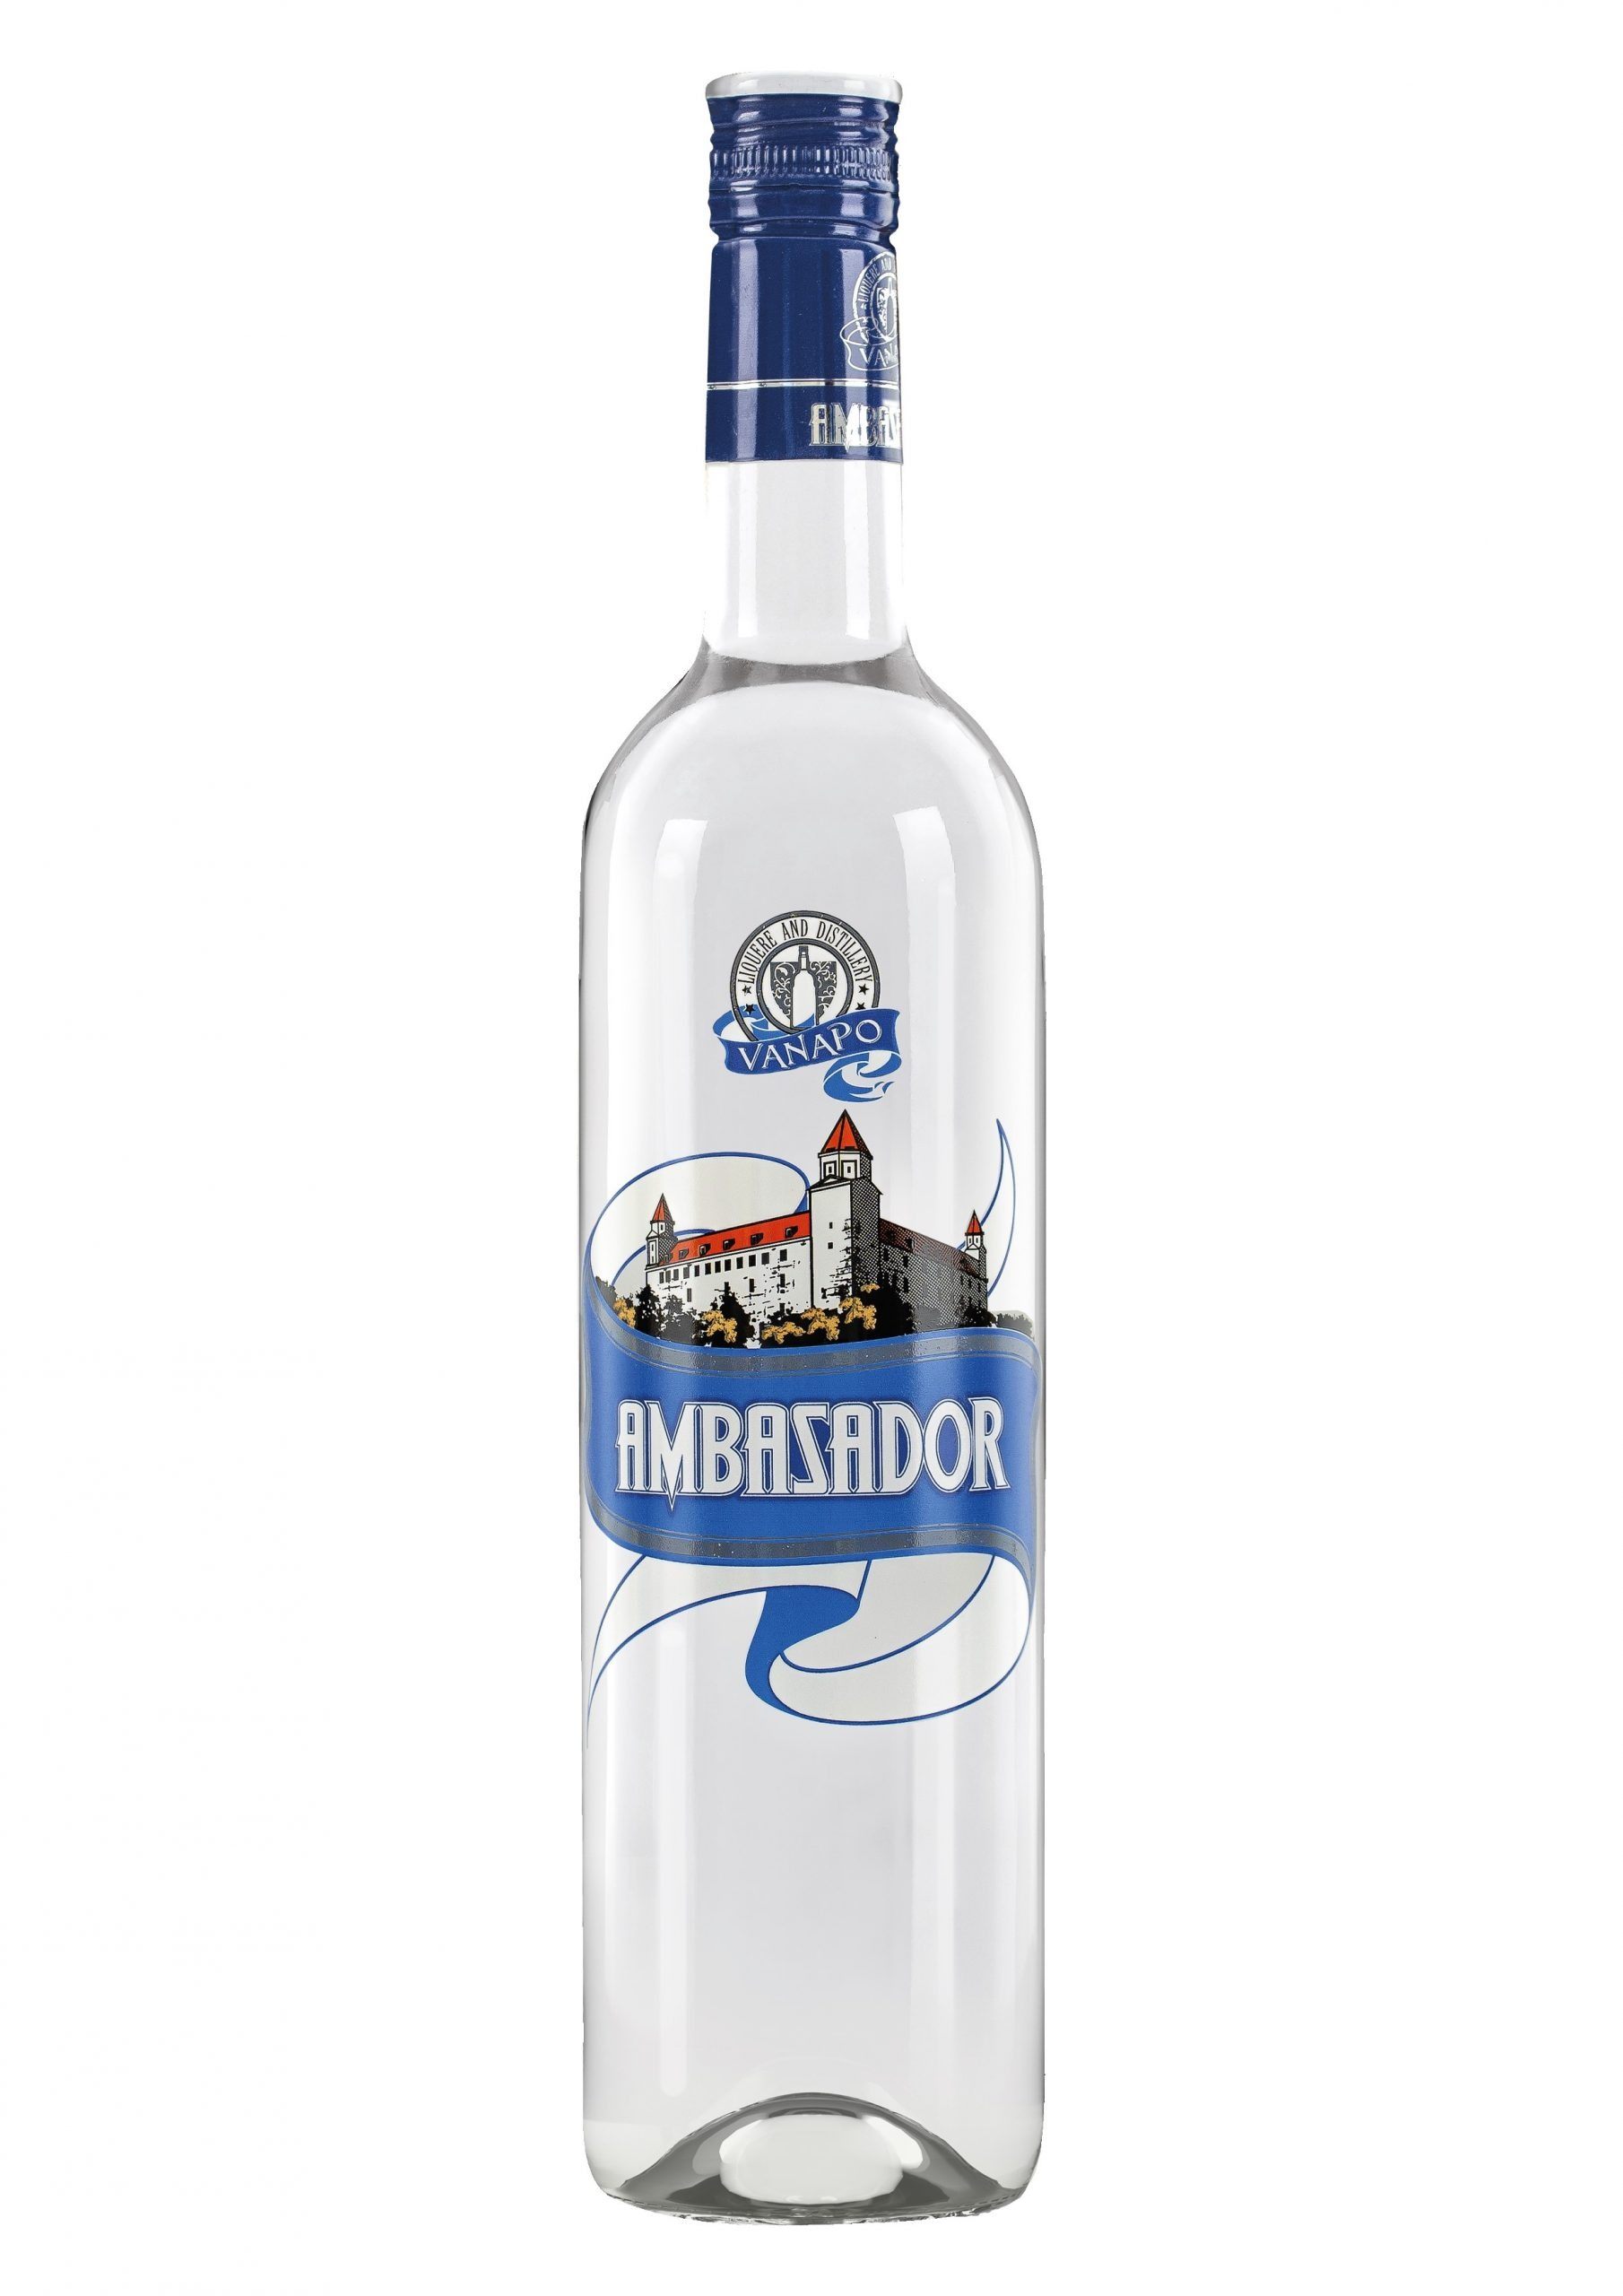 Vodka Ambasador 38 07L scaled 1 - Vodka Ambasador